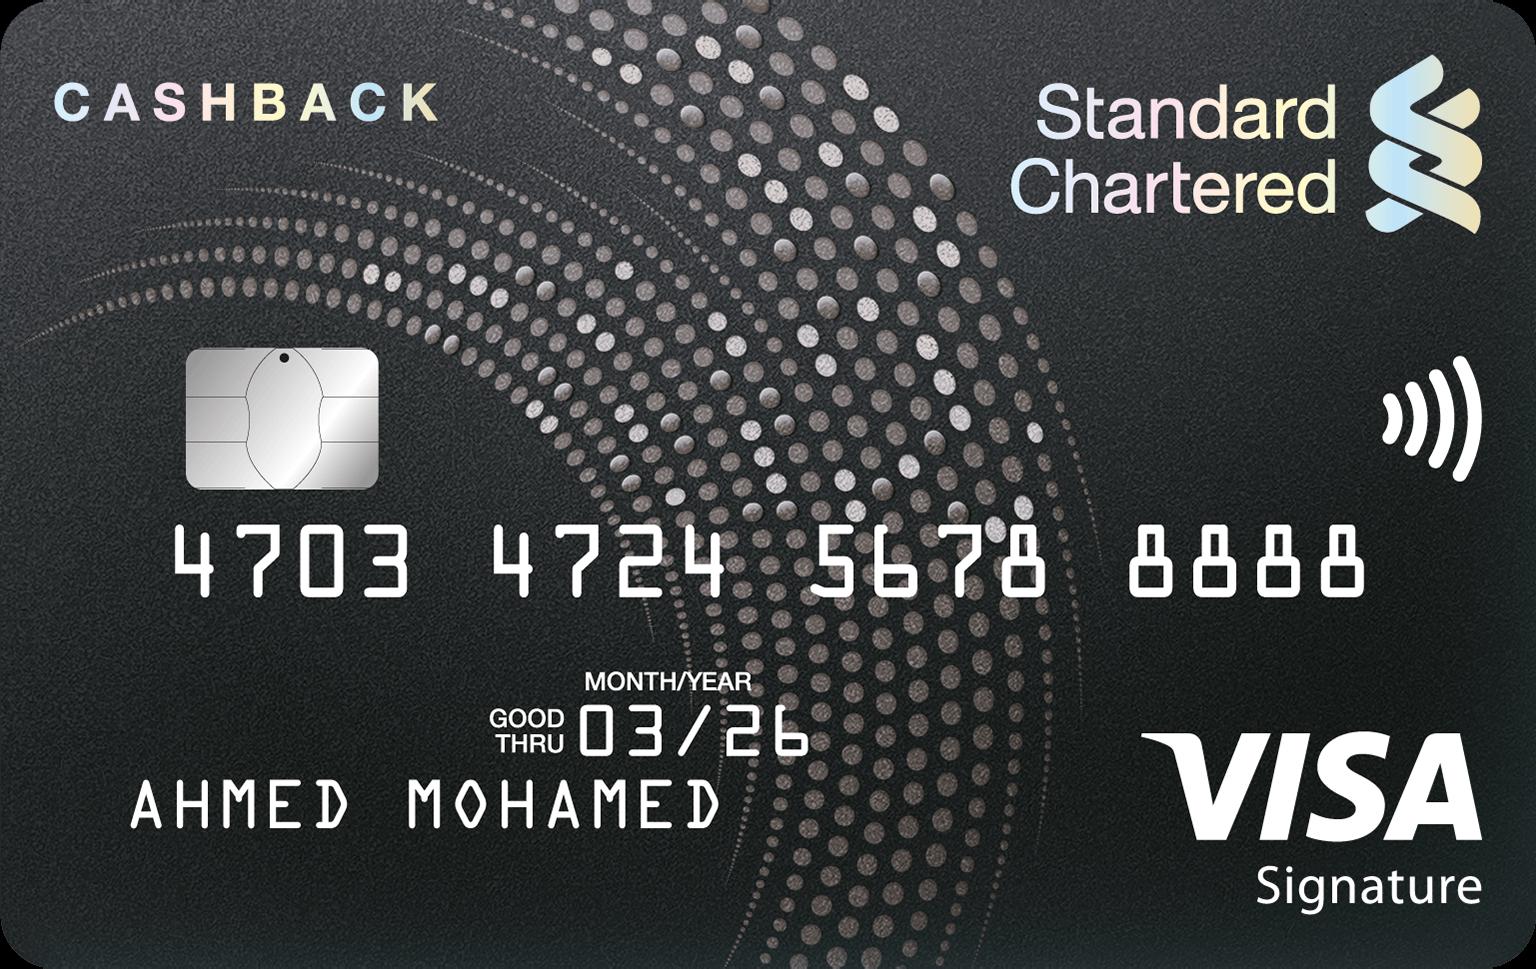 Cashback Card